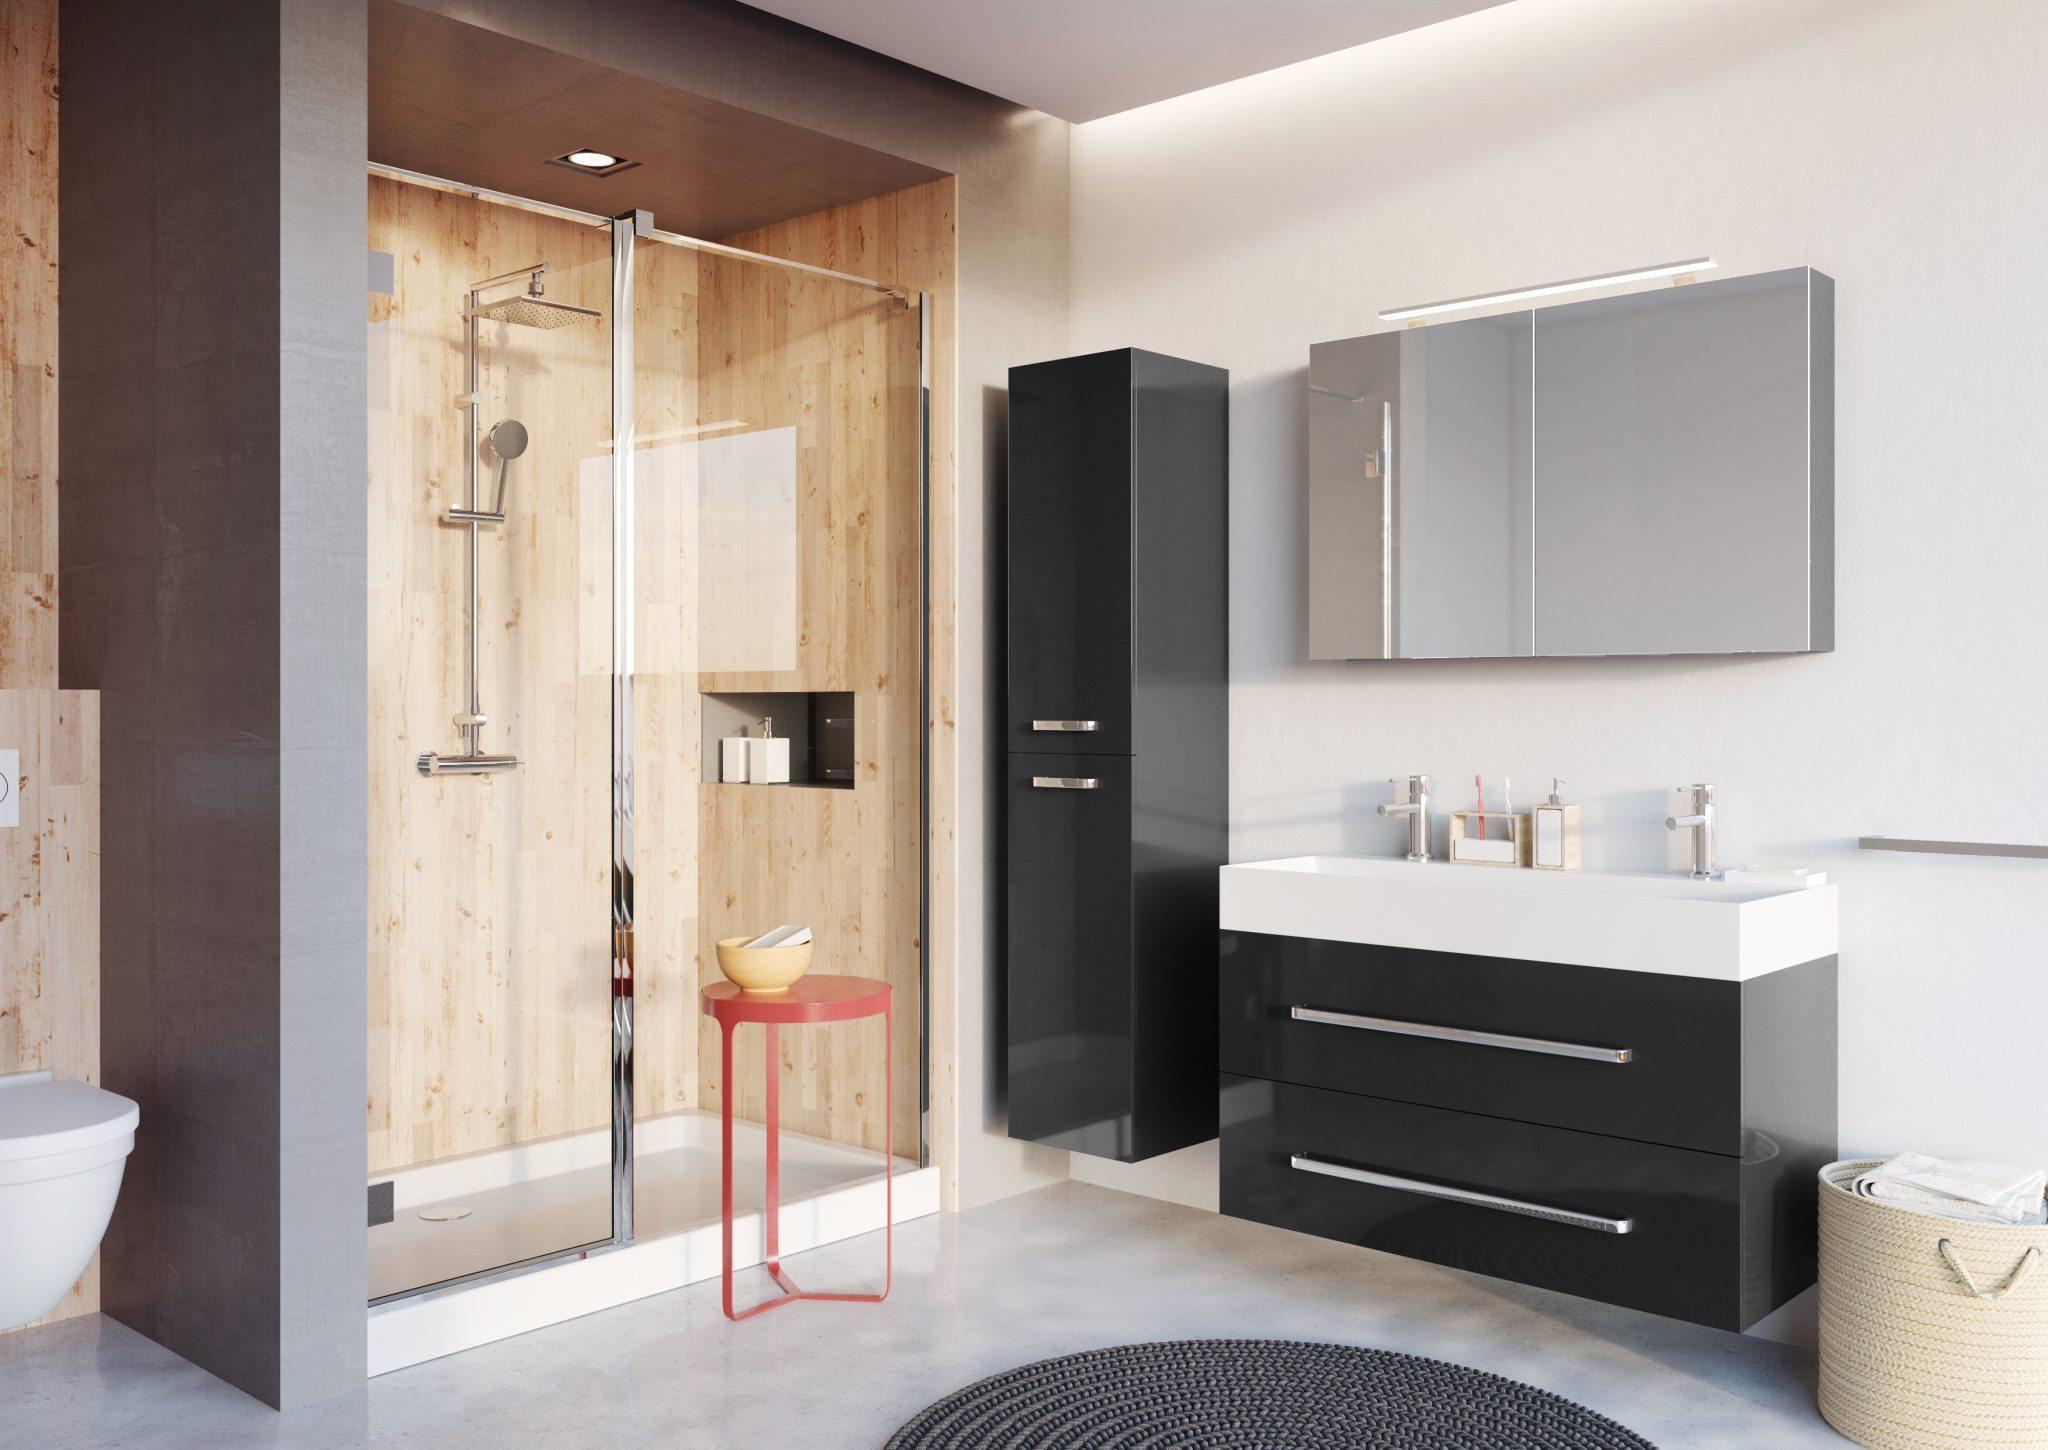 Mooi badkamermeubel met instapdouche badkamermeubels ontwerpen